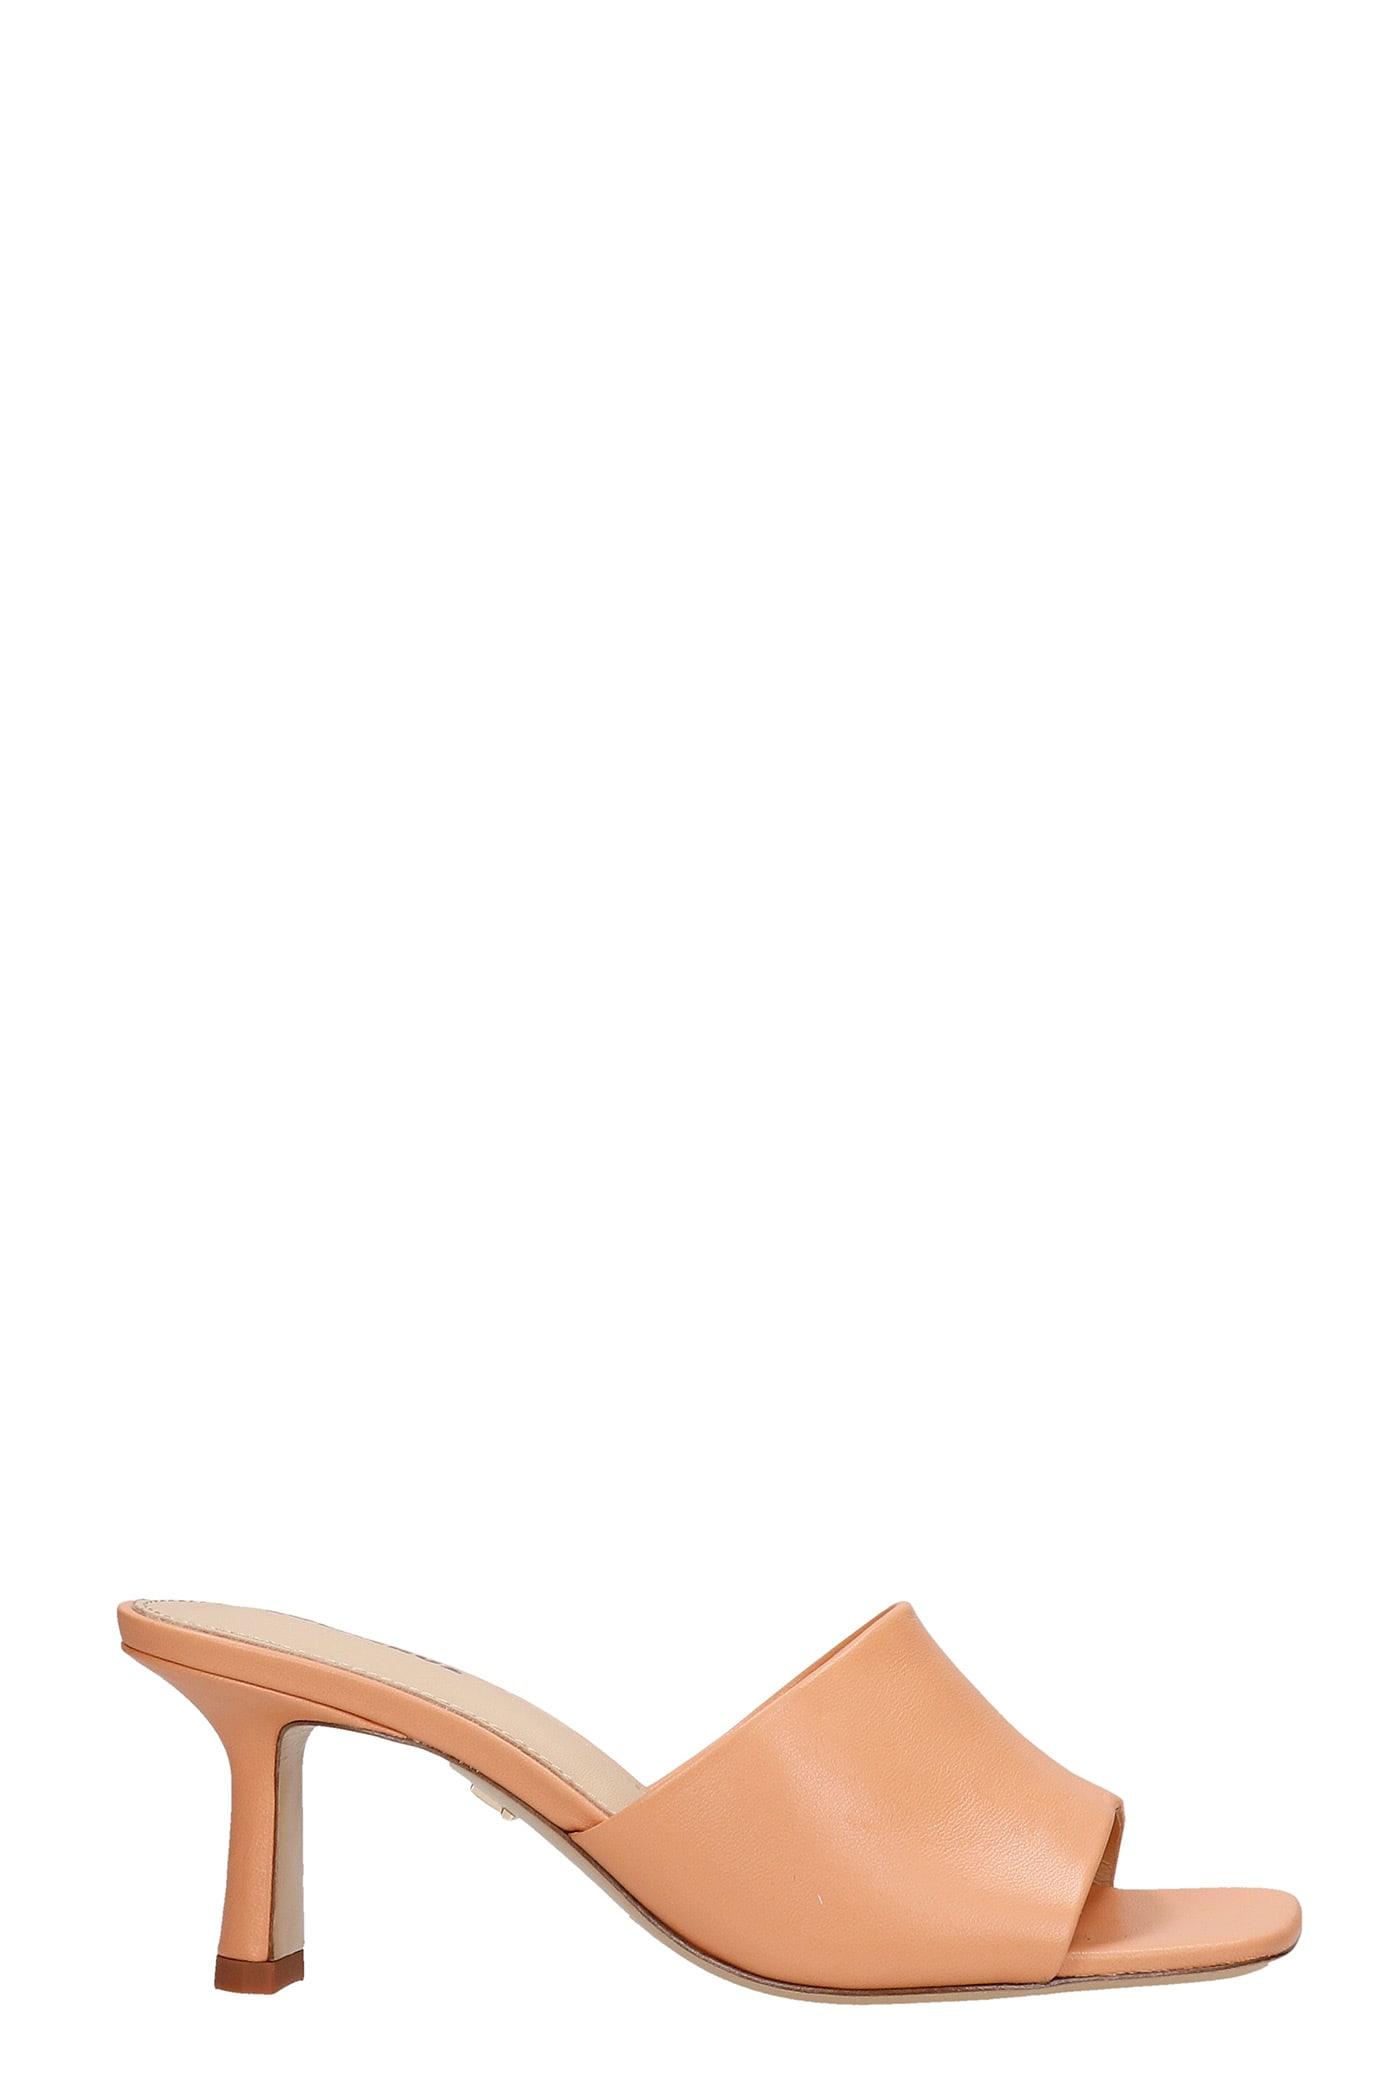 Sandals In Orange Leather